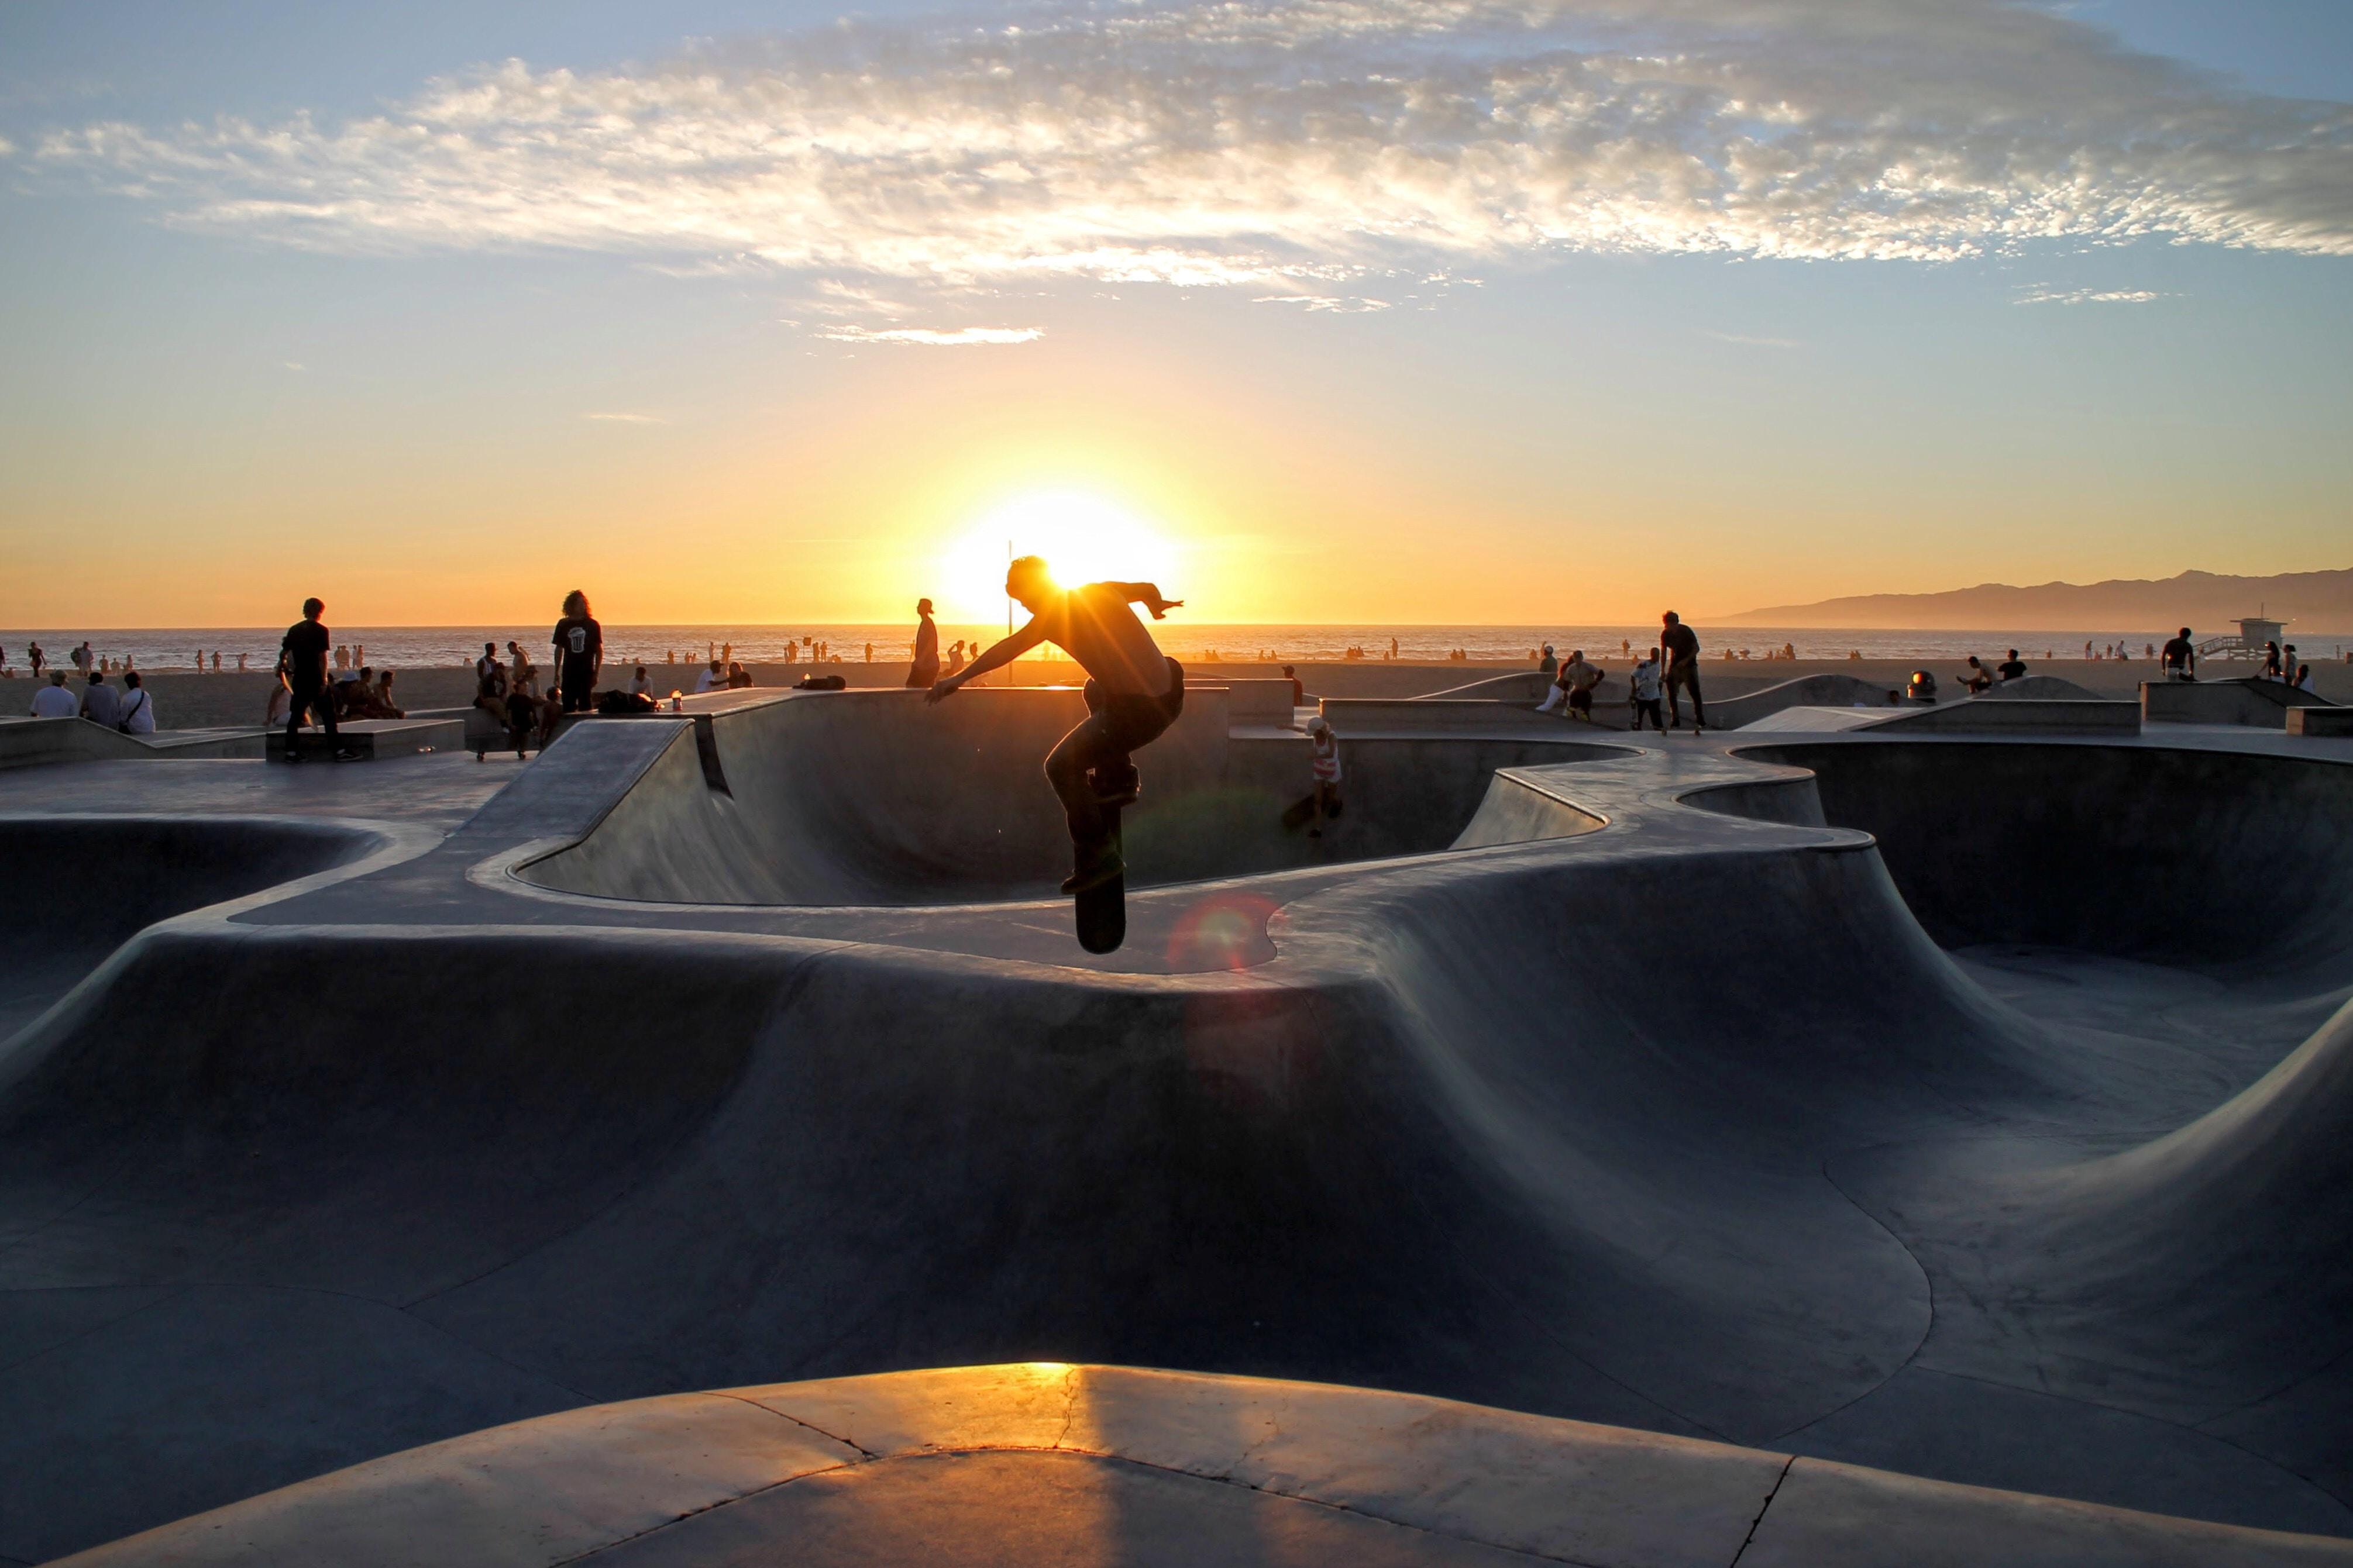 silhouette photo of man riding skateboard on skateboard ramp field